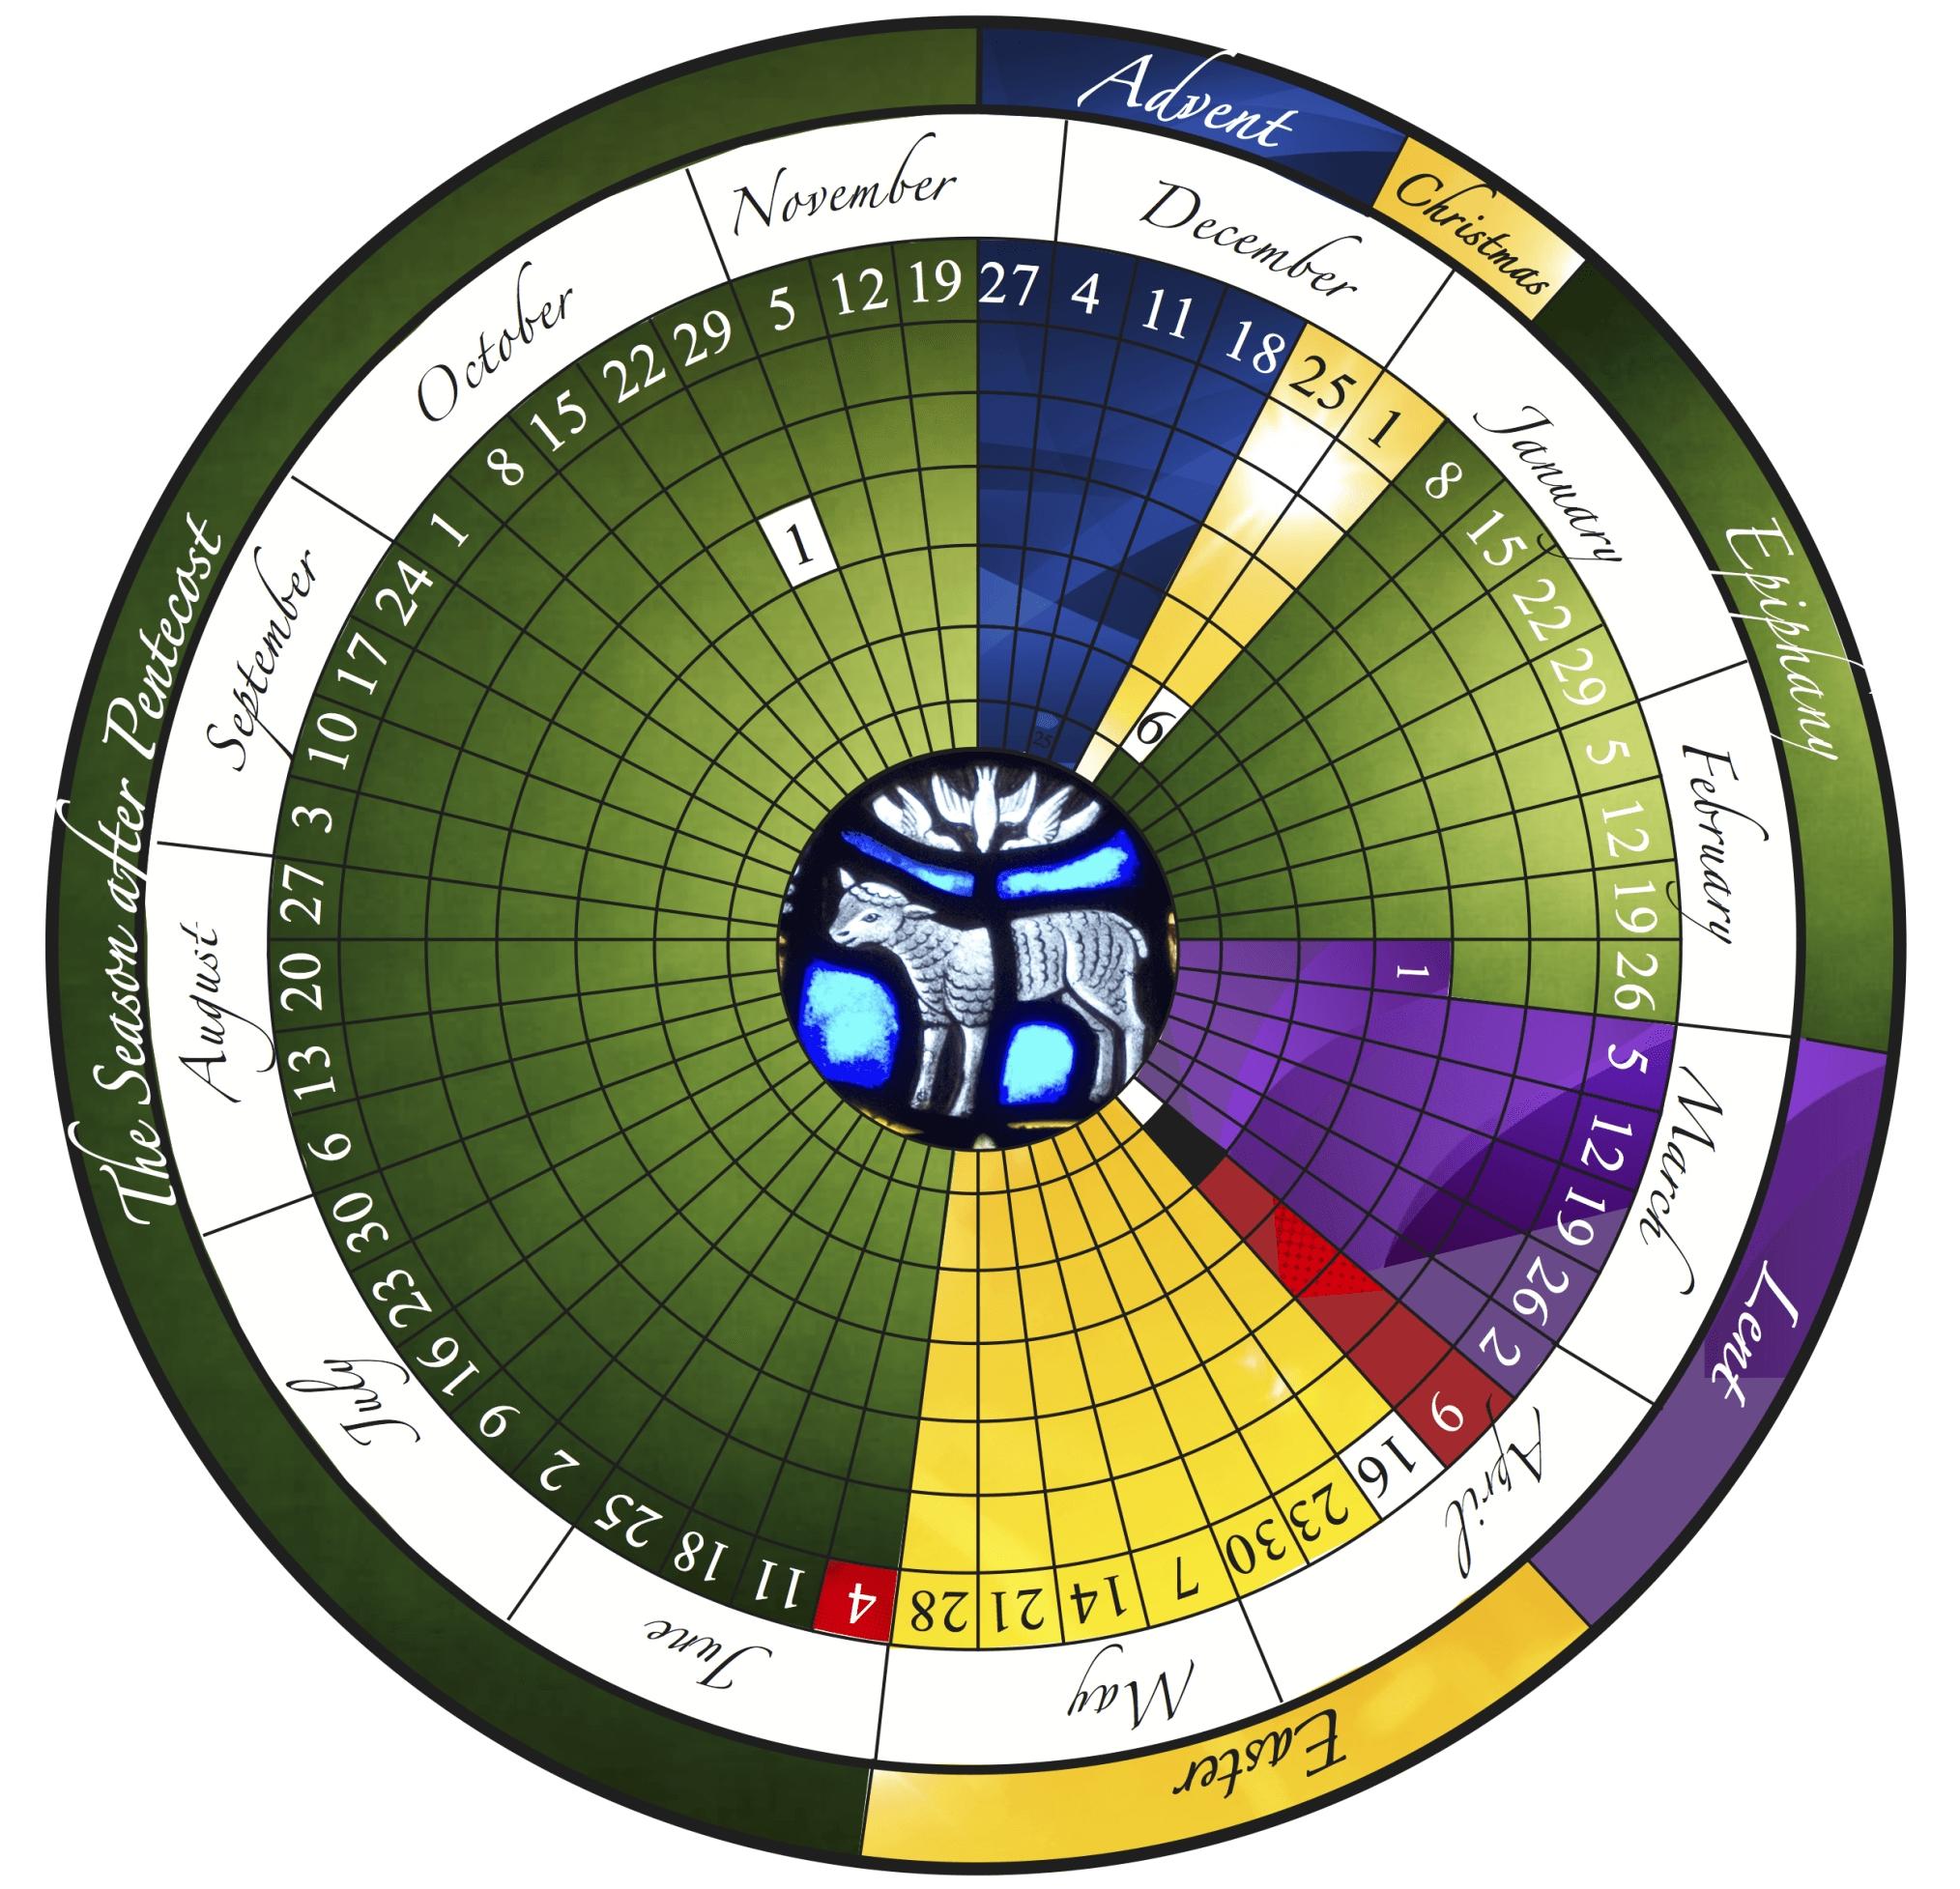 The Liturgical Year Explained (Plus Free Printable Calendar!)  Liturgical Calendar